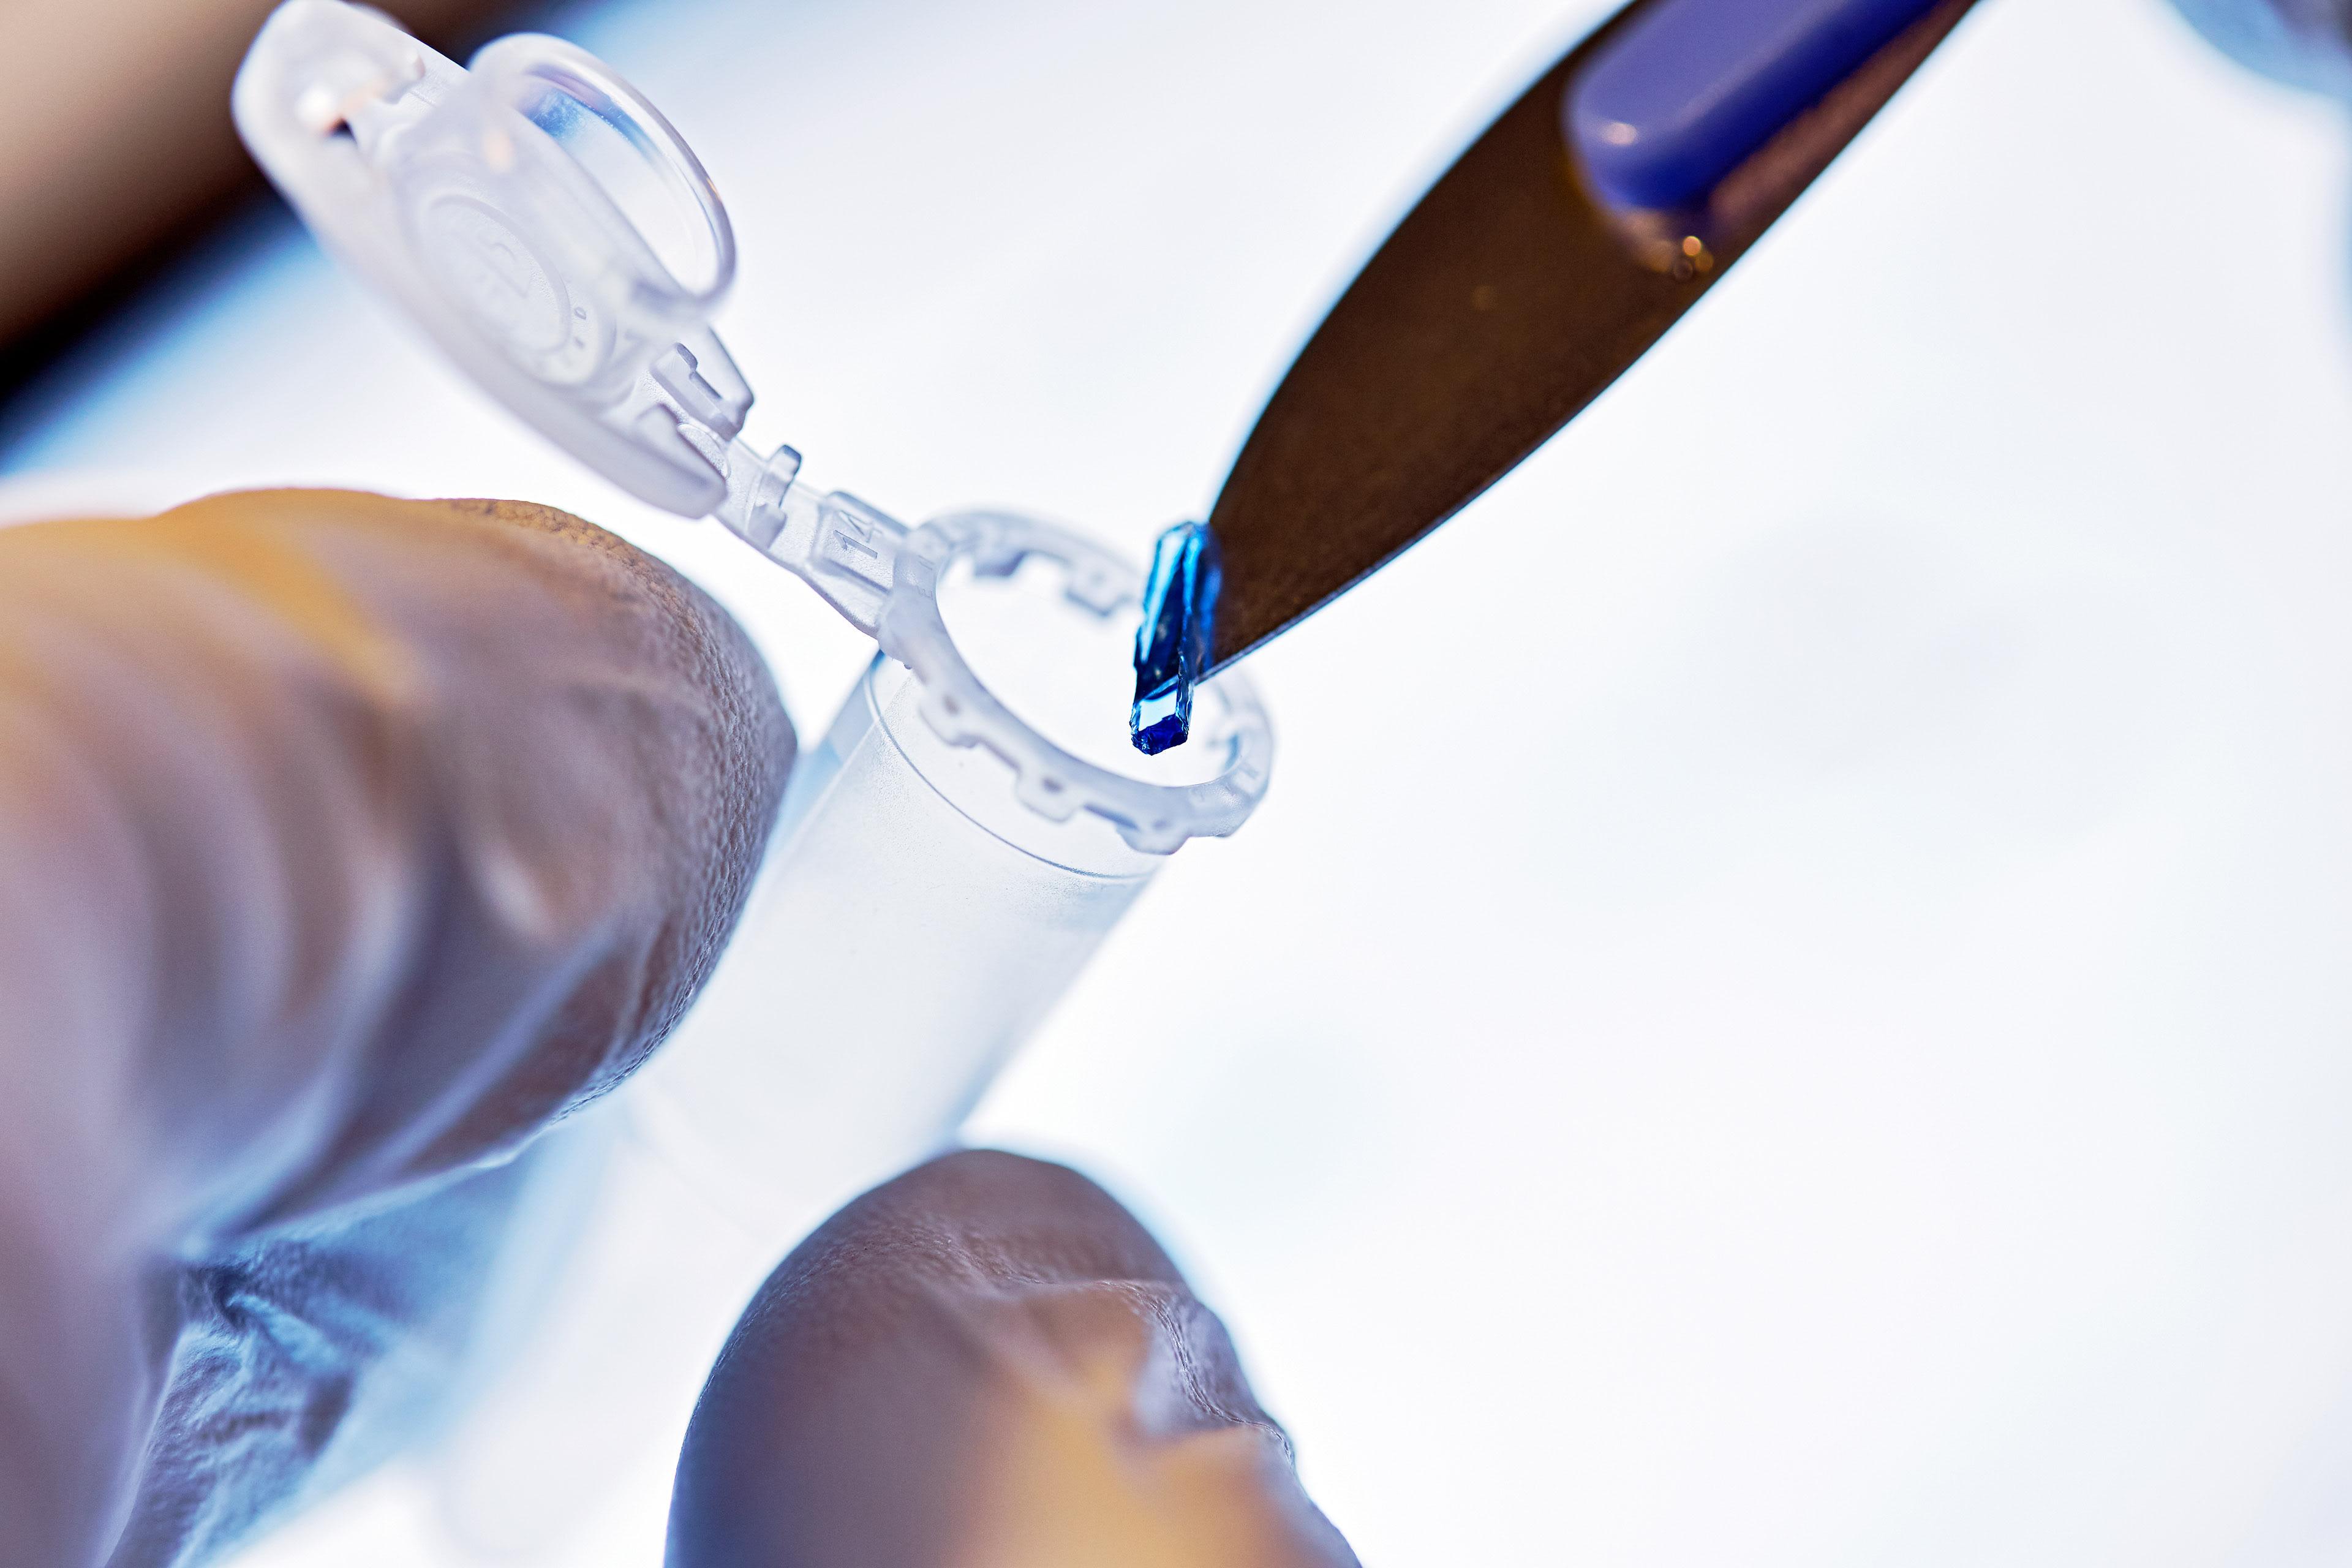 Richard Moran GSK Pharma Science Detail 003